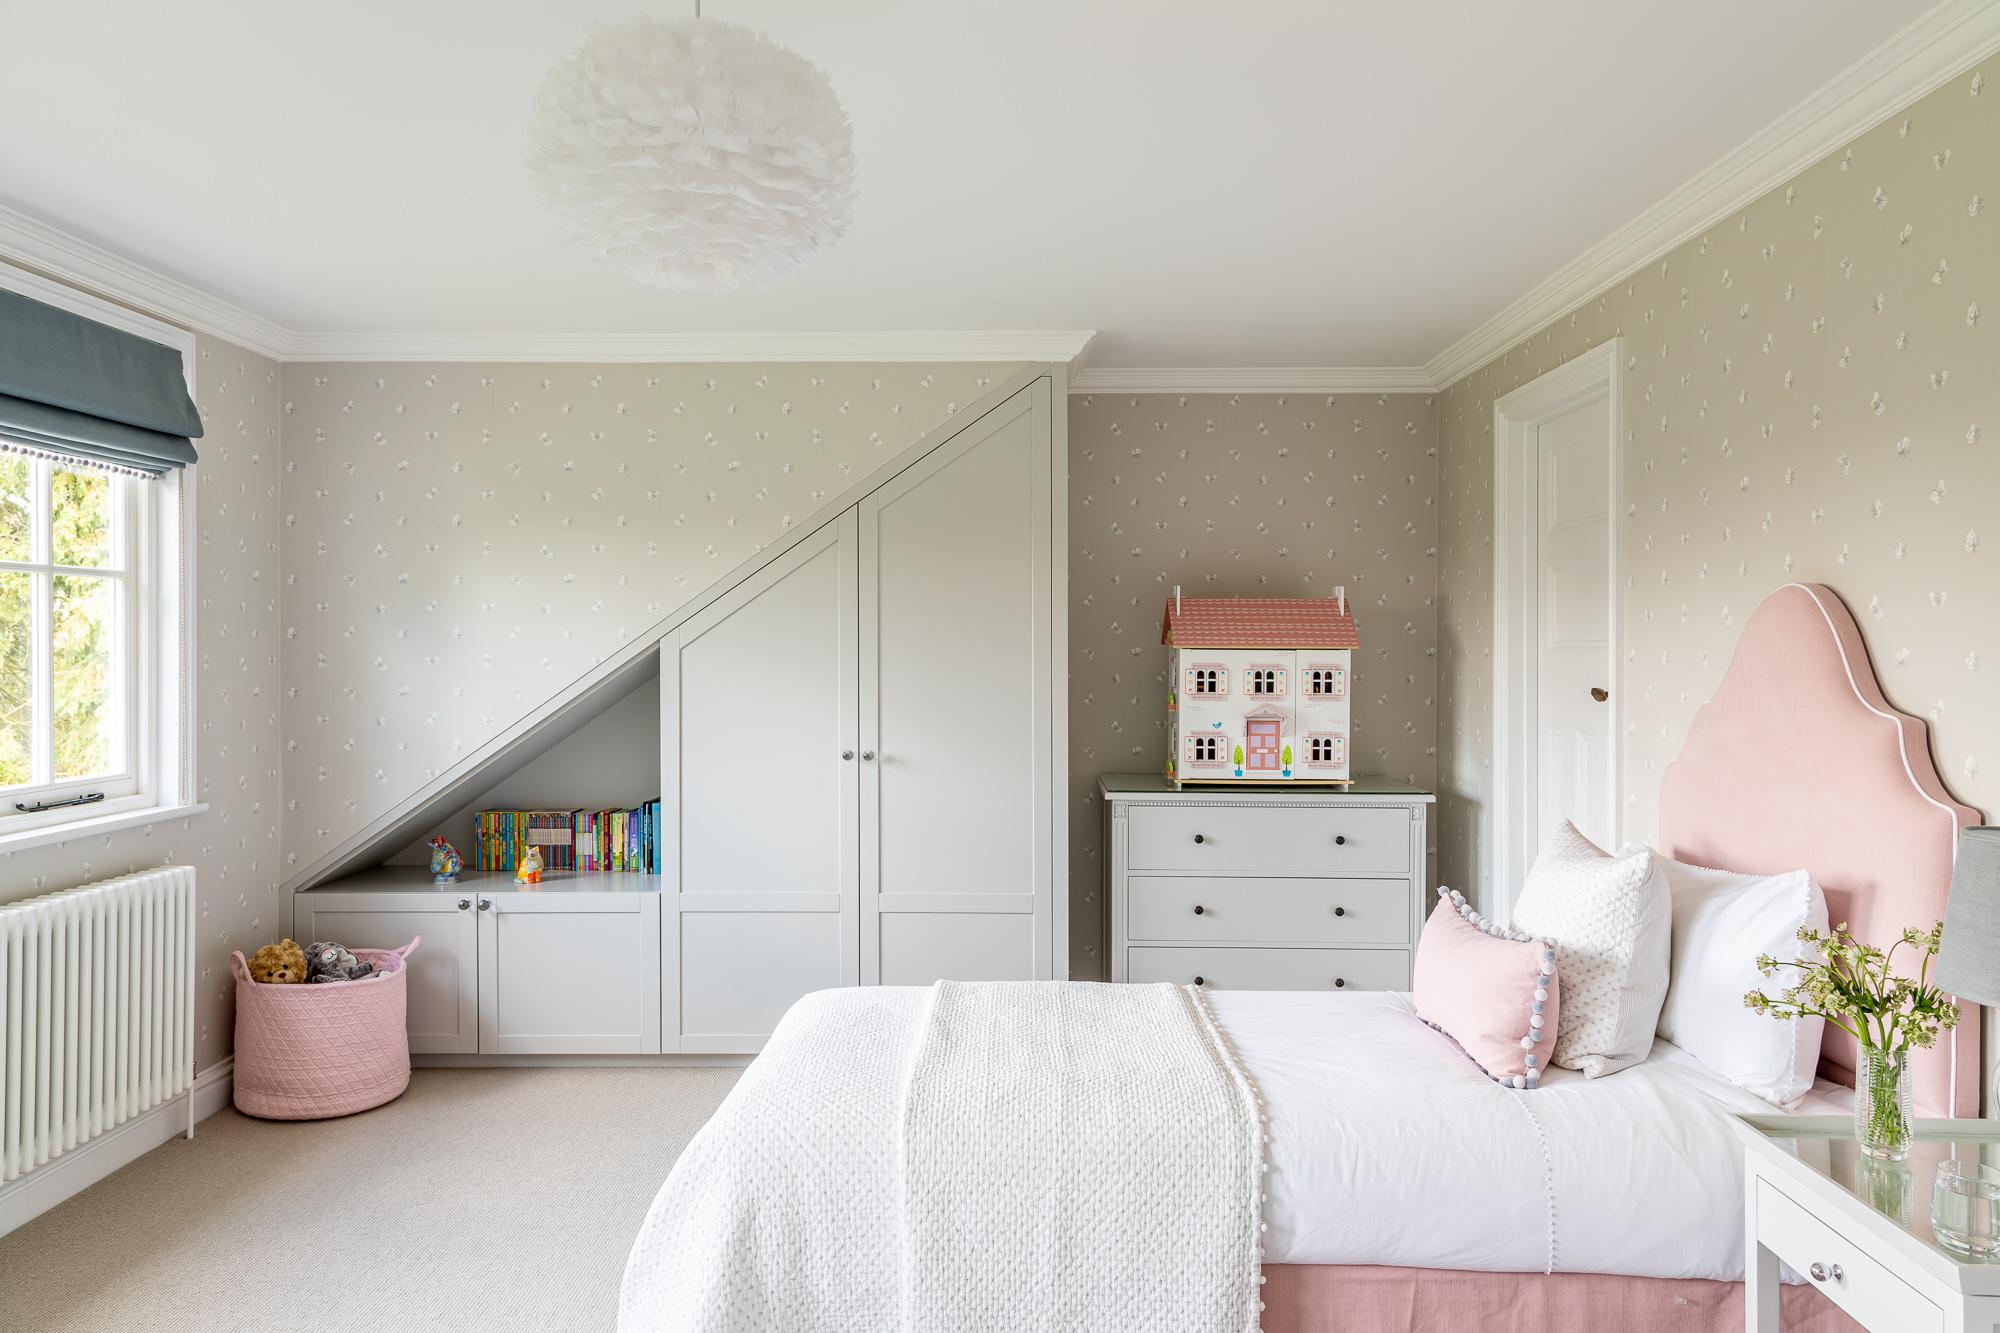 jonathan bond, interior photographer, childs bedroom double bed, great missenden, buckinghamshire